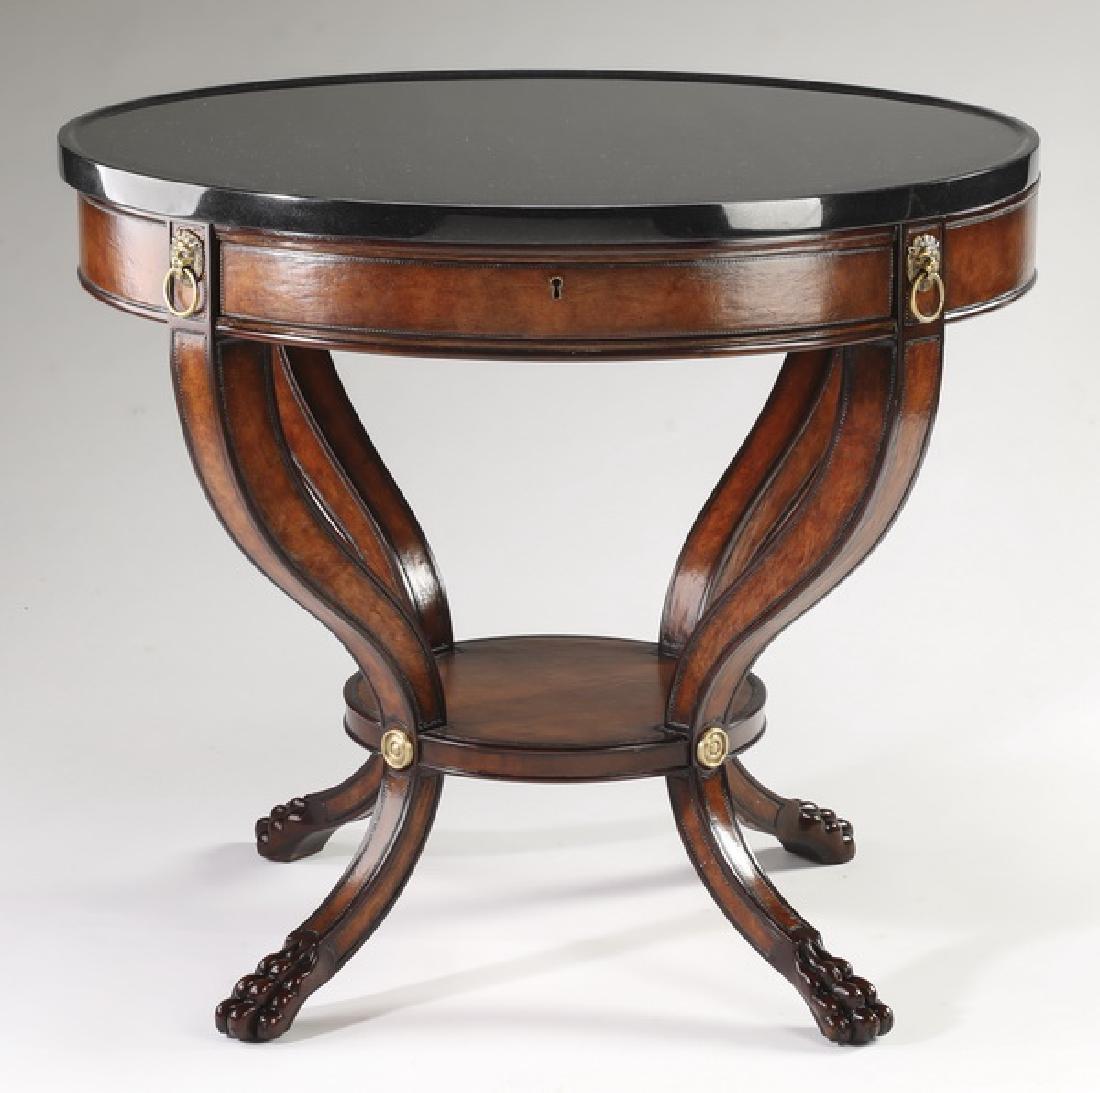 Henredon Regency style black marble top table